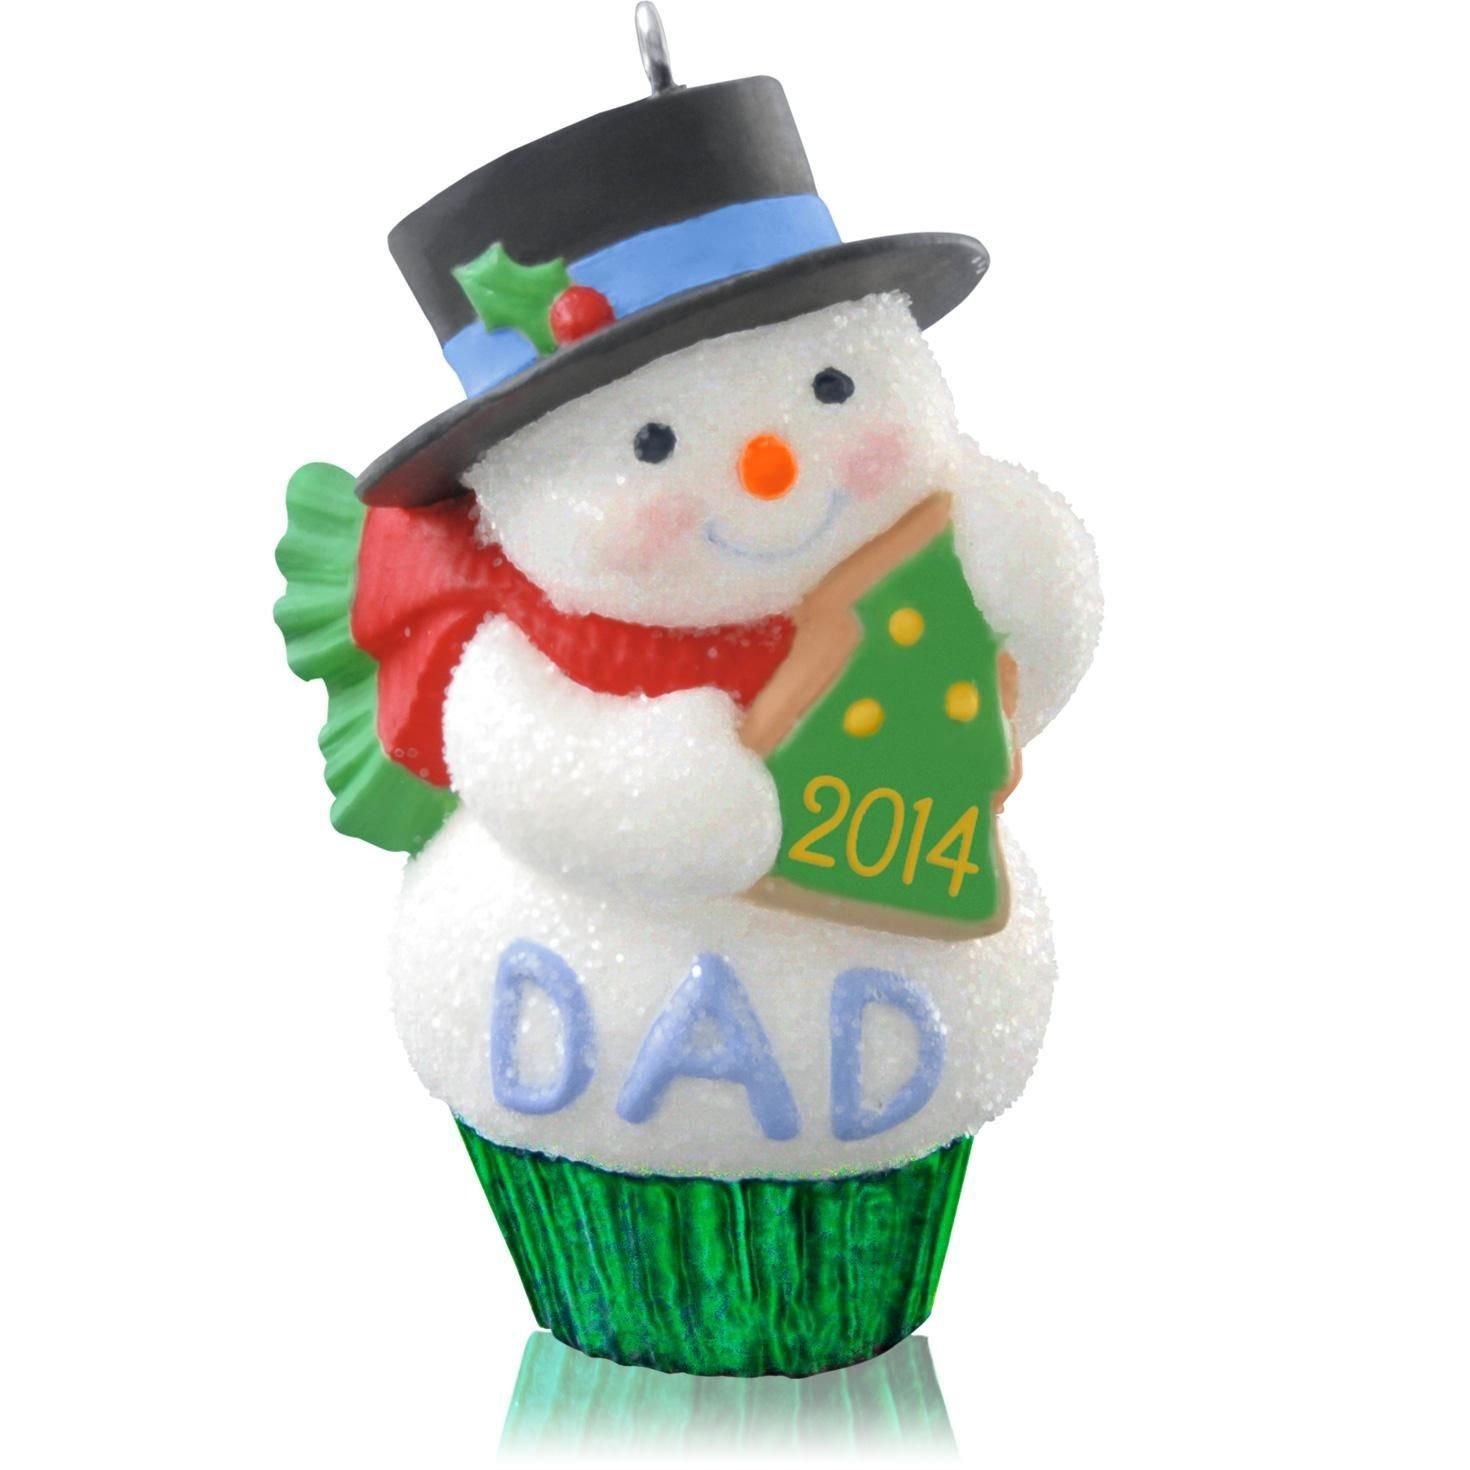 amazoncom hallmark qgo1093 dad 2014 hallmark keepsake ornament everything else - What To Get Dad For Christmas 2014